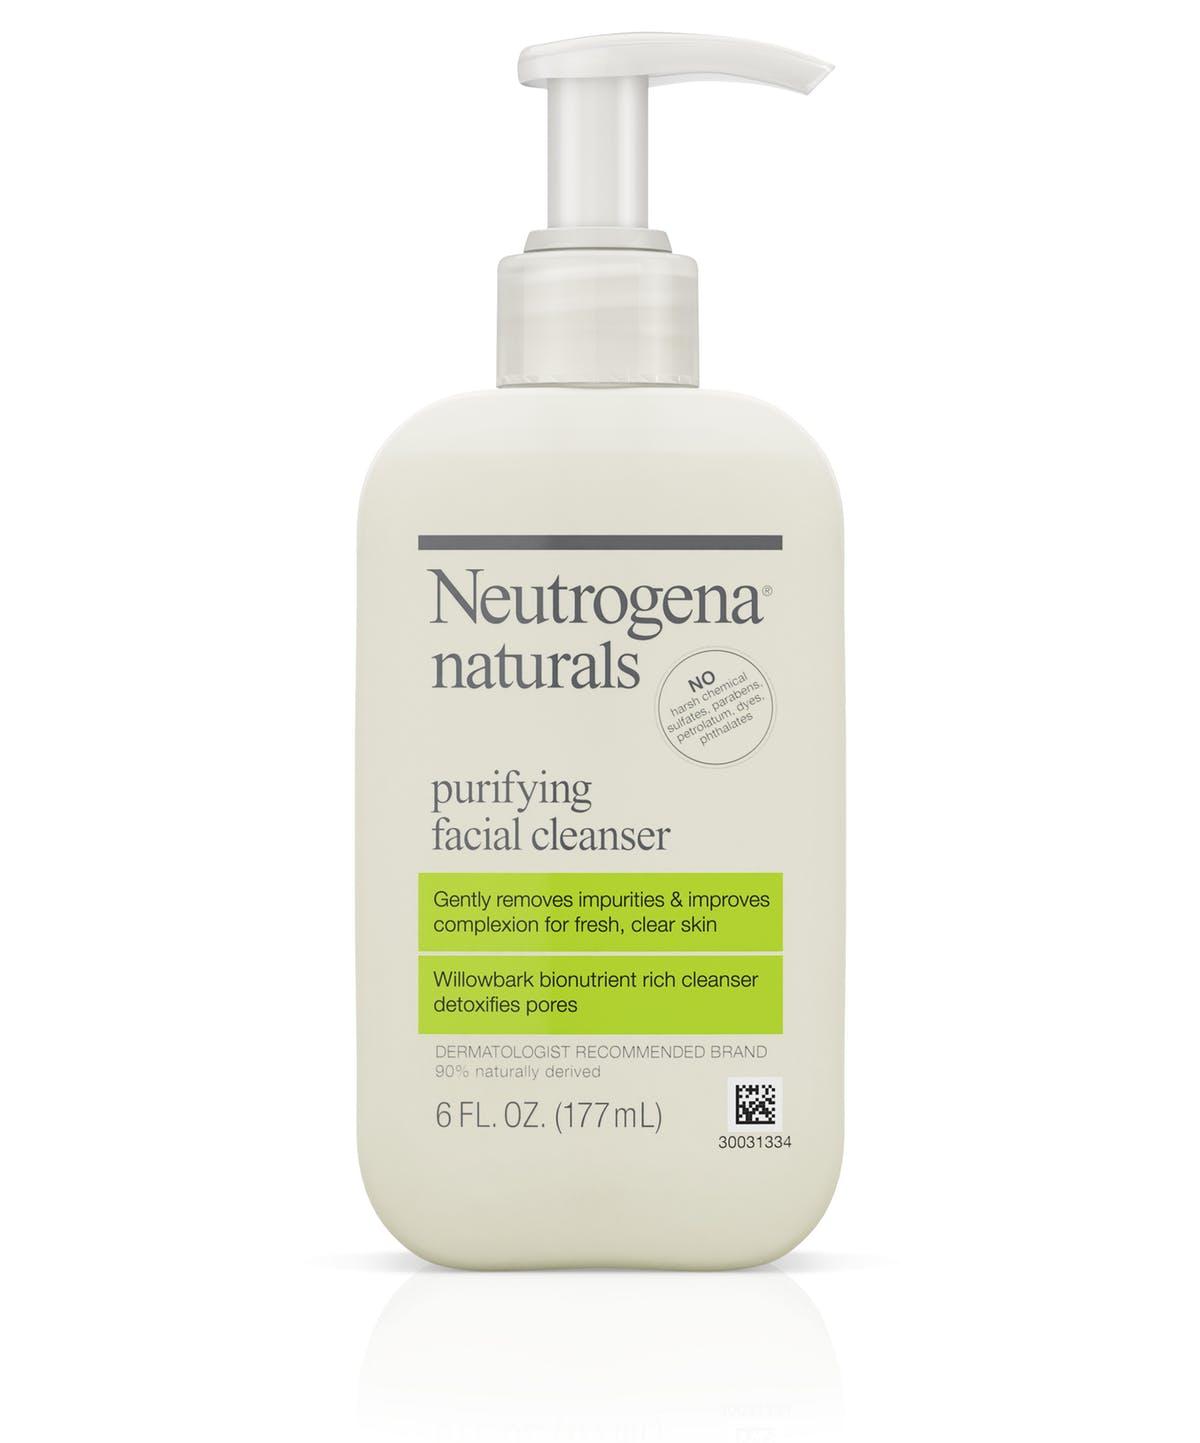 neutrogena naturals purifying facial cleanser salicylic acid face wash